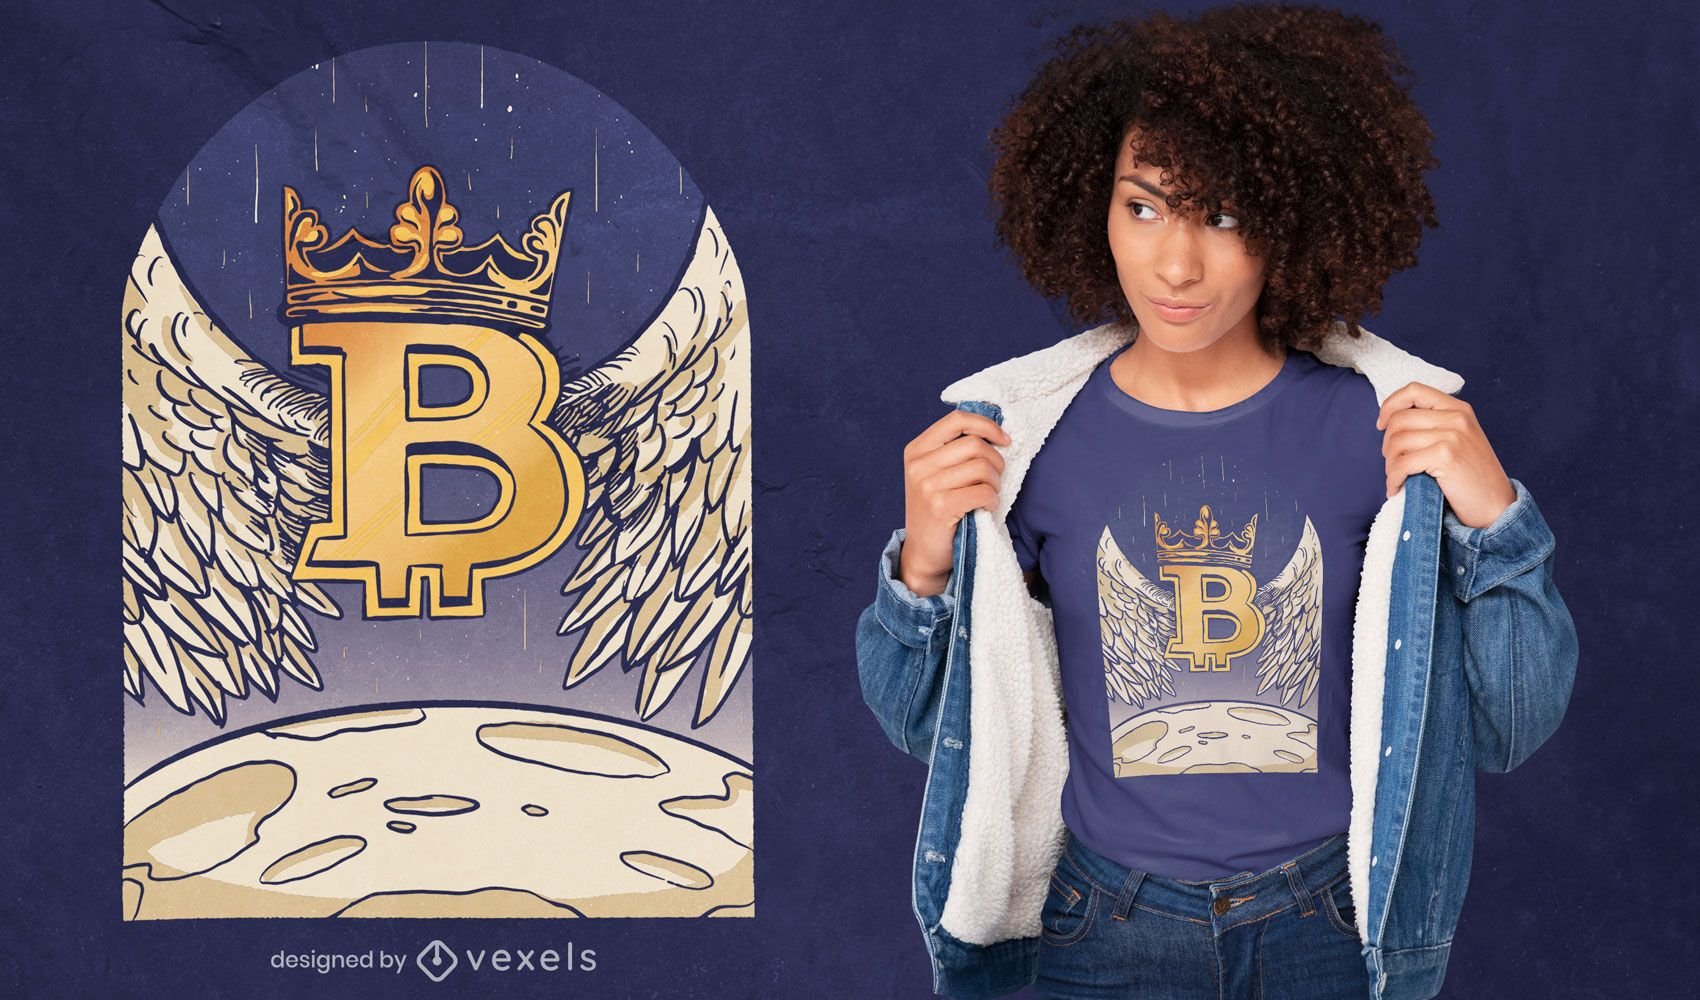 Angel bitcoin landing on the moon t-shirt design